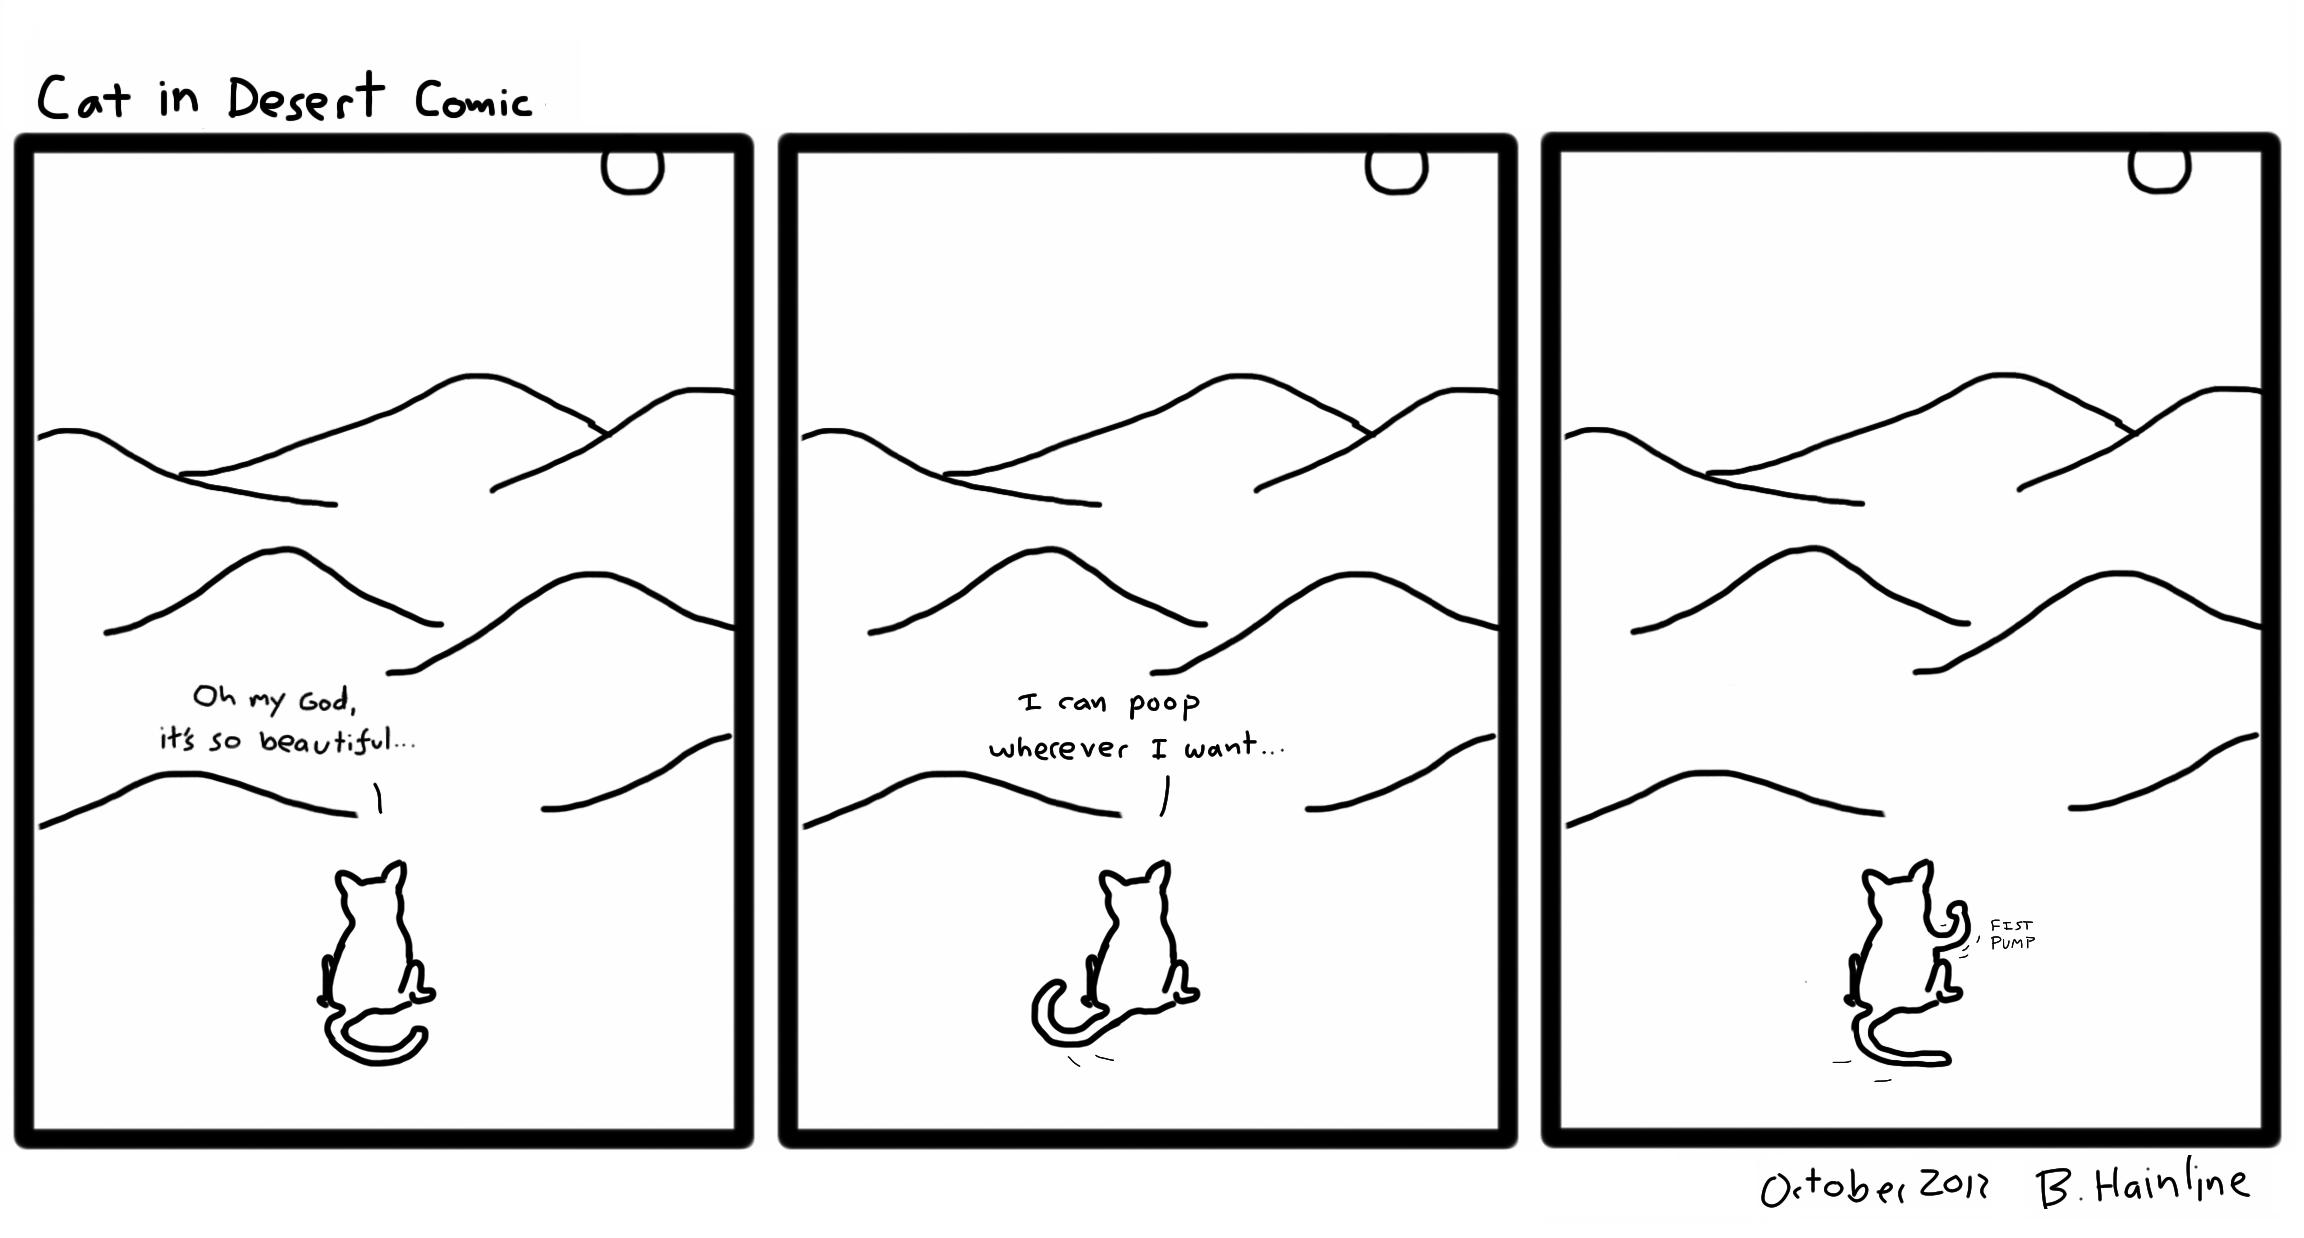 Cat in Desert Comic